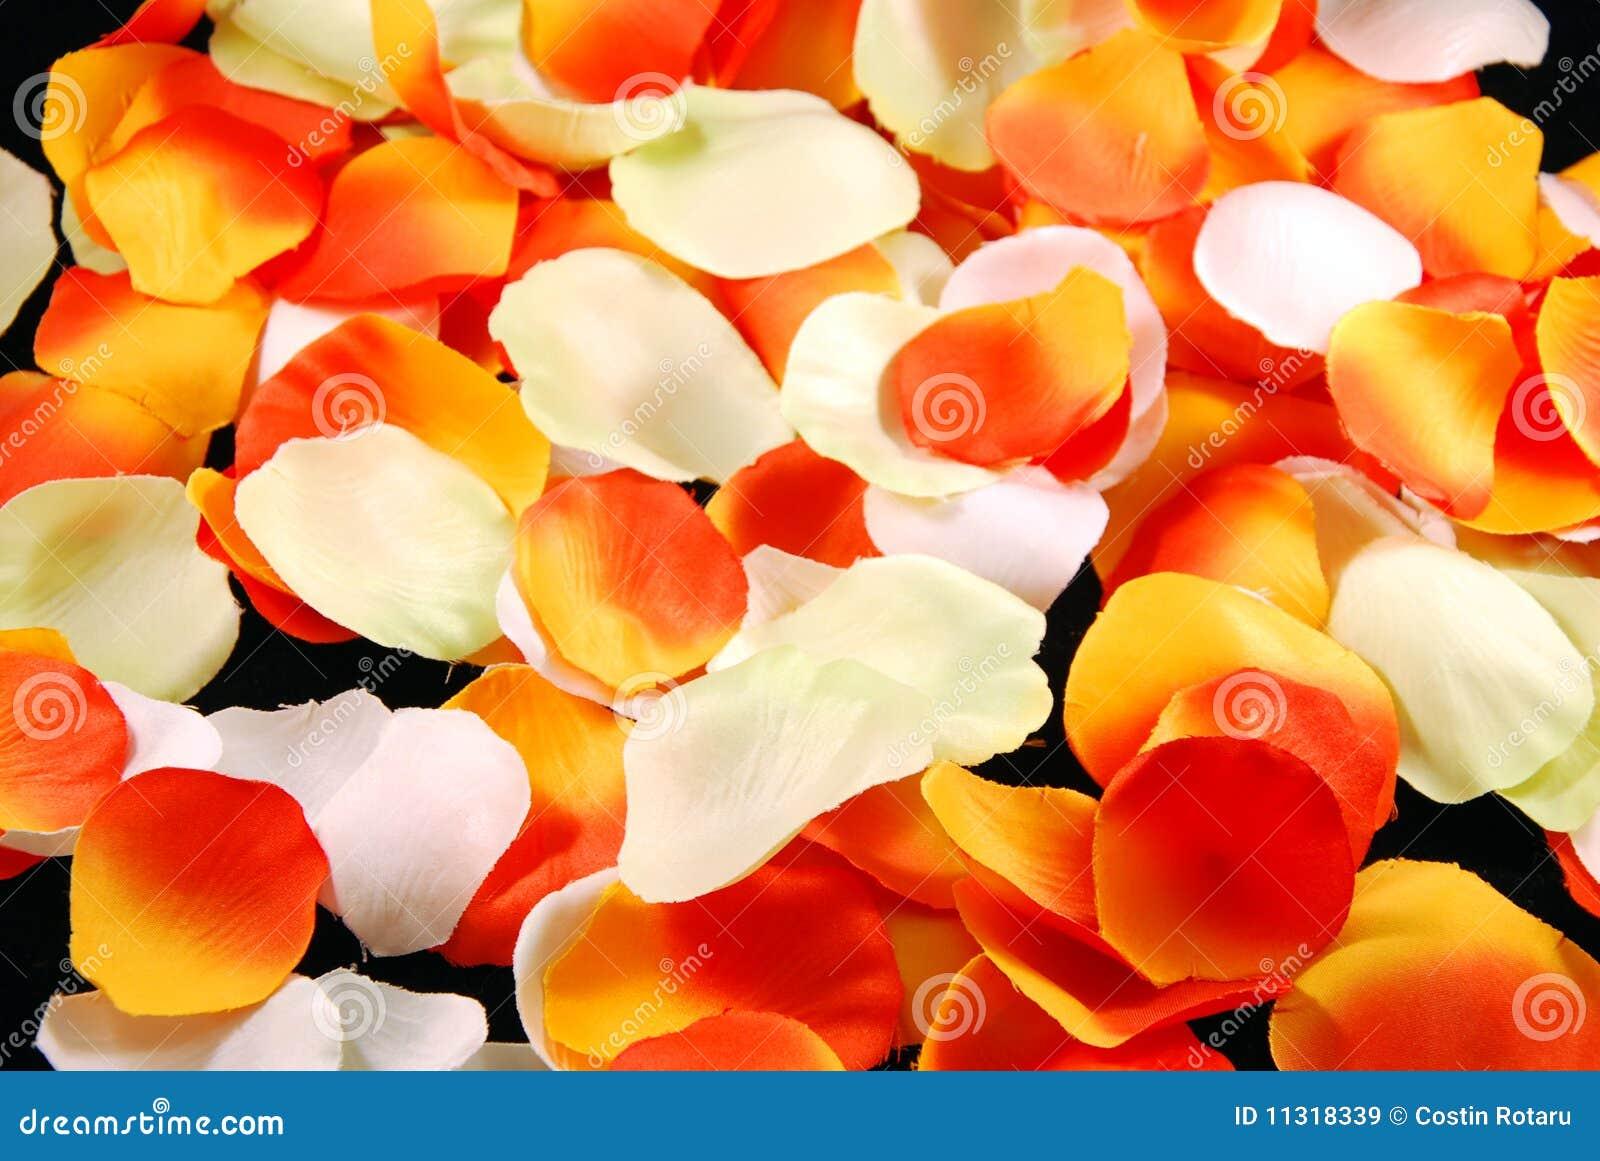 Blumenblätter